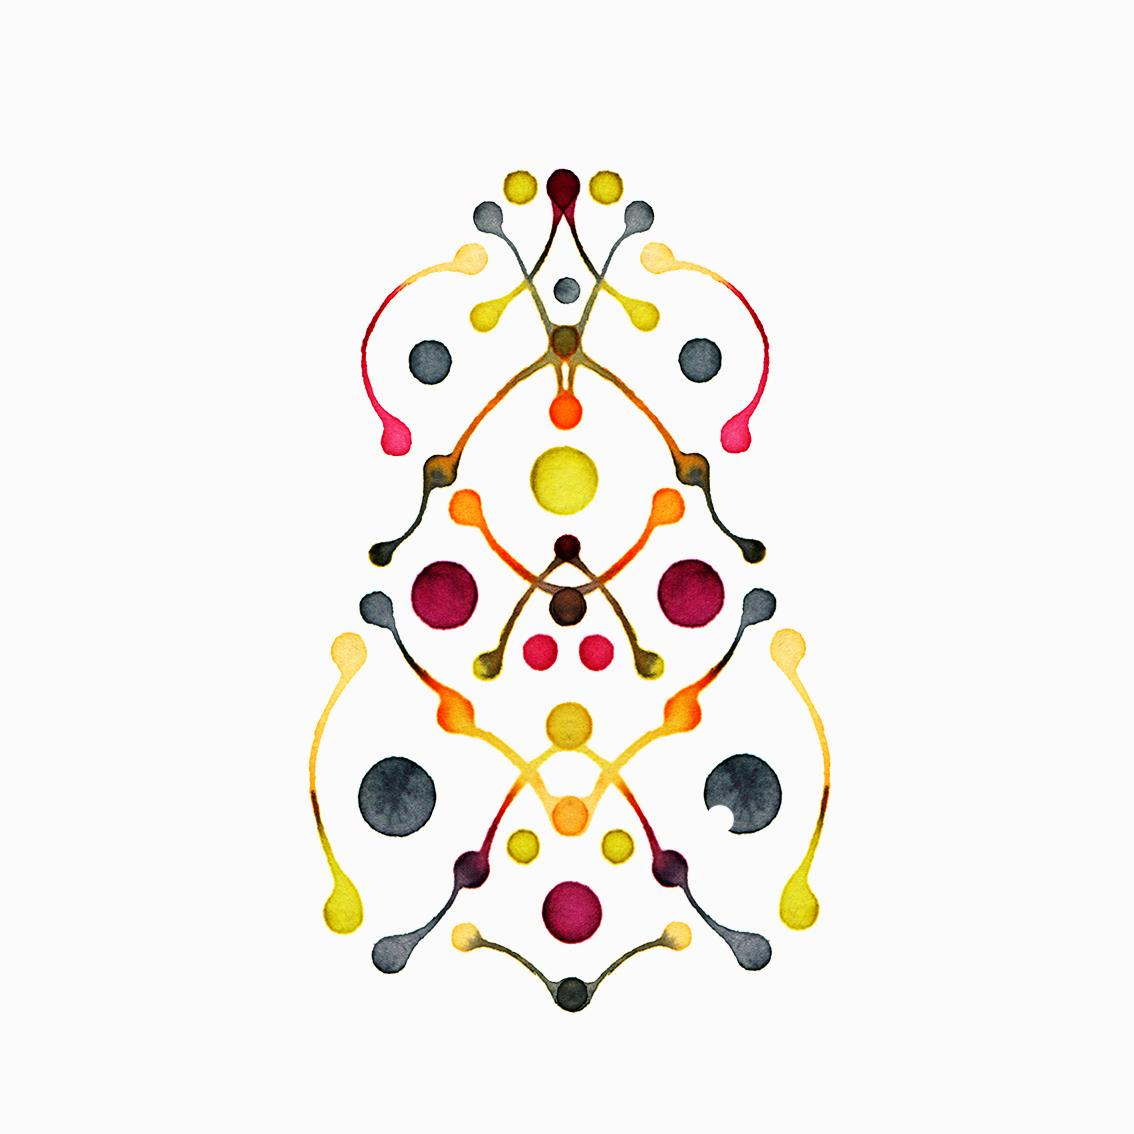 dotting_abstract_3_1_72